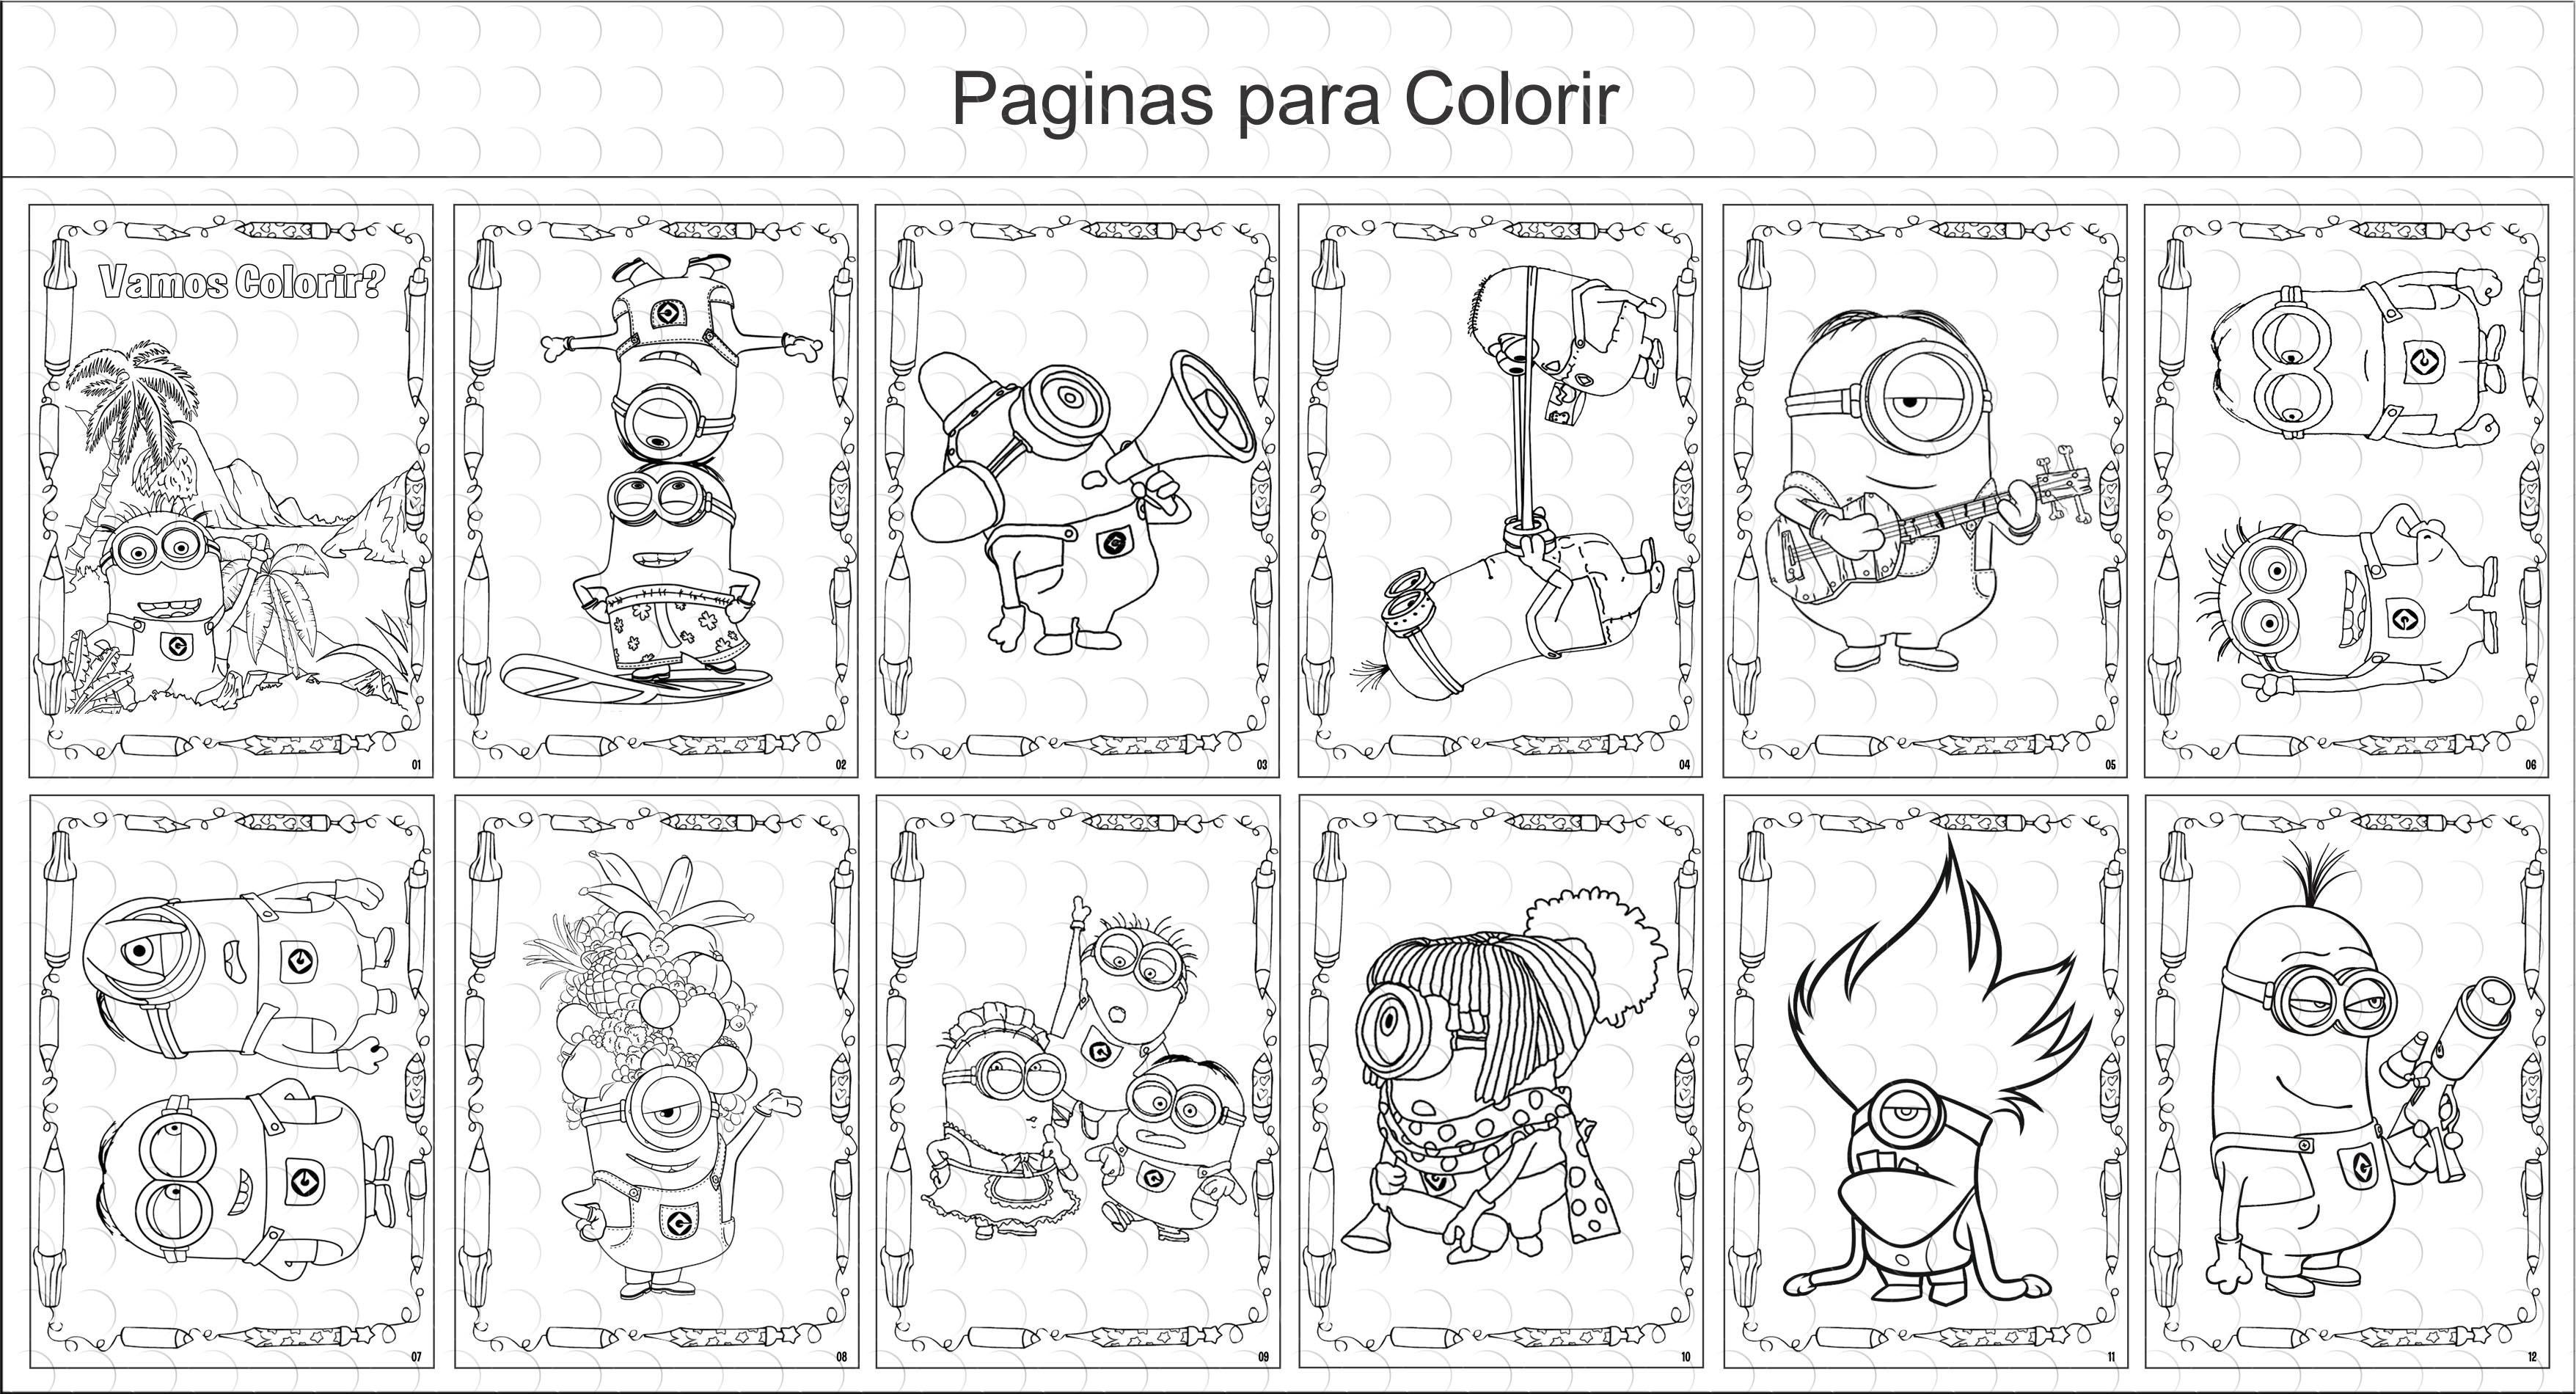 Livros Para Colorir - Minions